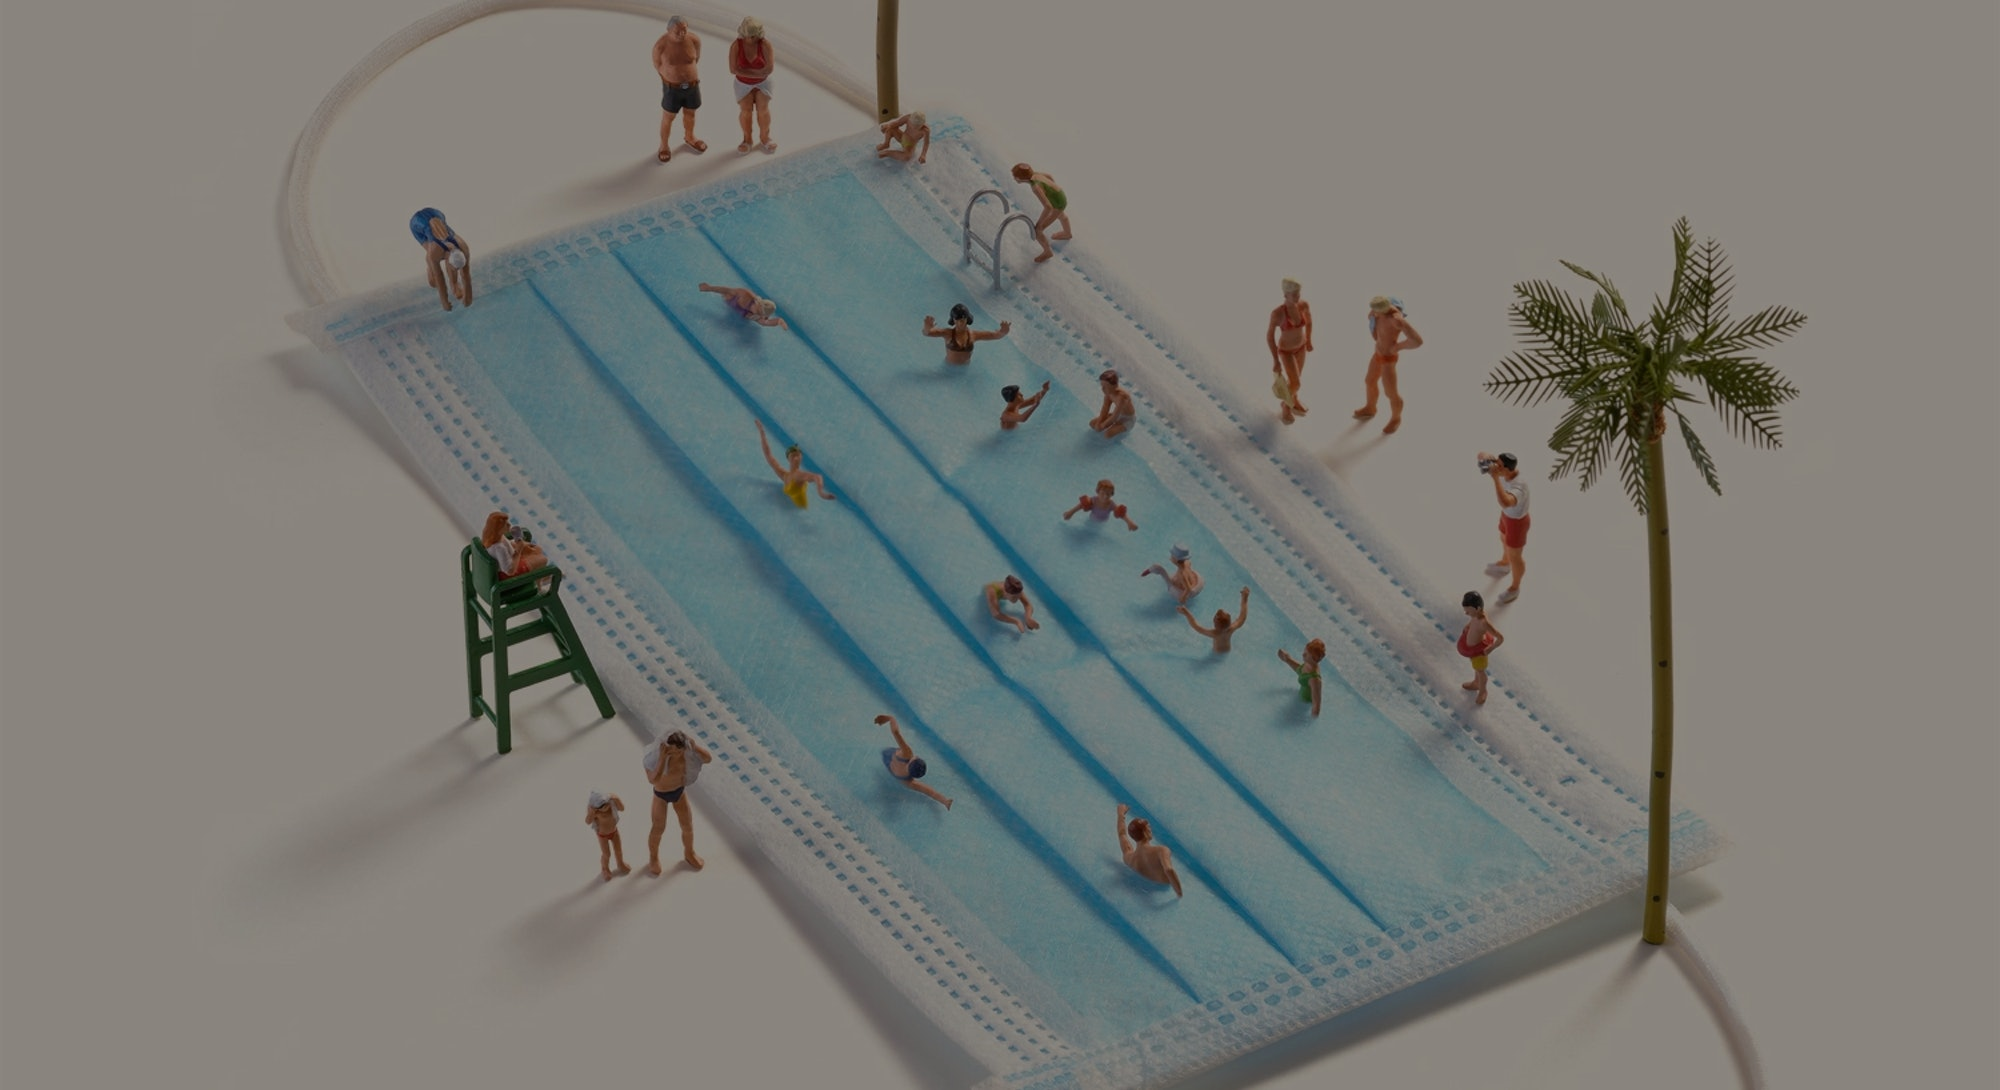 Tatsuya Tanaka used a blue face mask and human figurines to create a miniature pool scene.